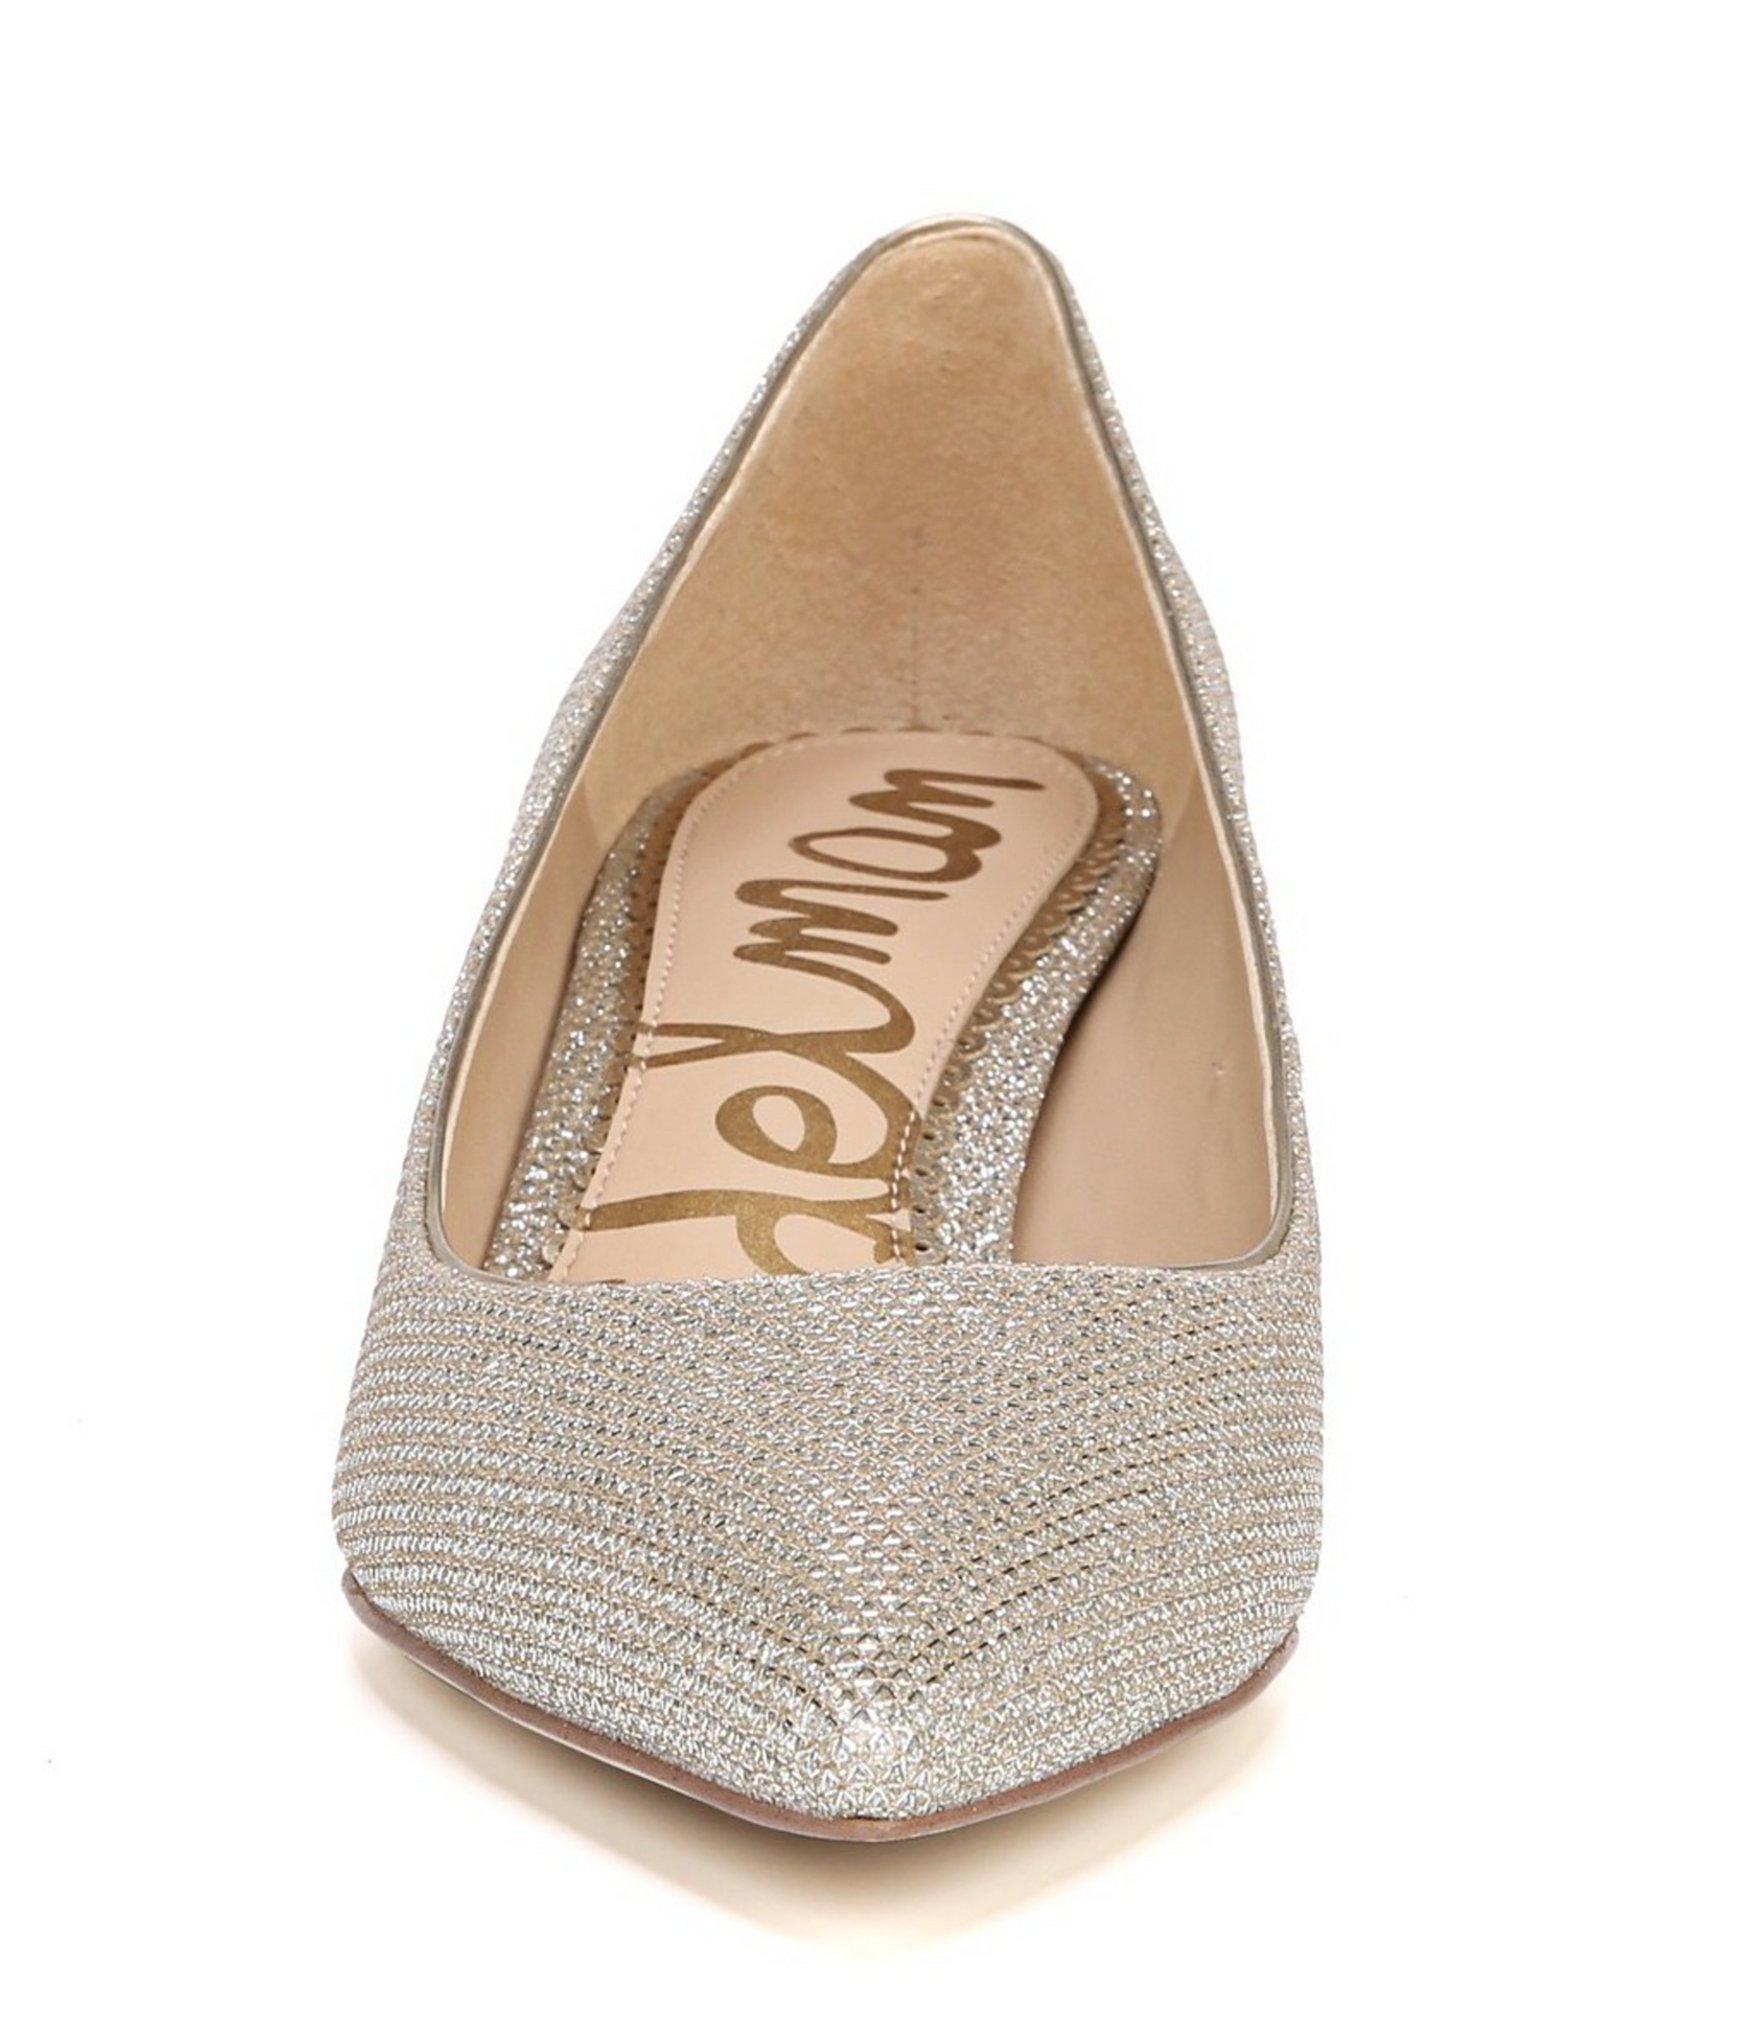 4fa35040d2 Sam Edelman Dori Metallic Glam Mesh Kitten Heel Dress Pumps in ...